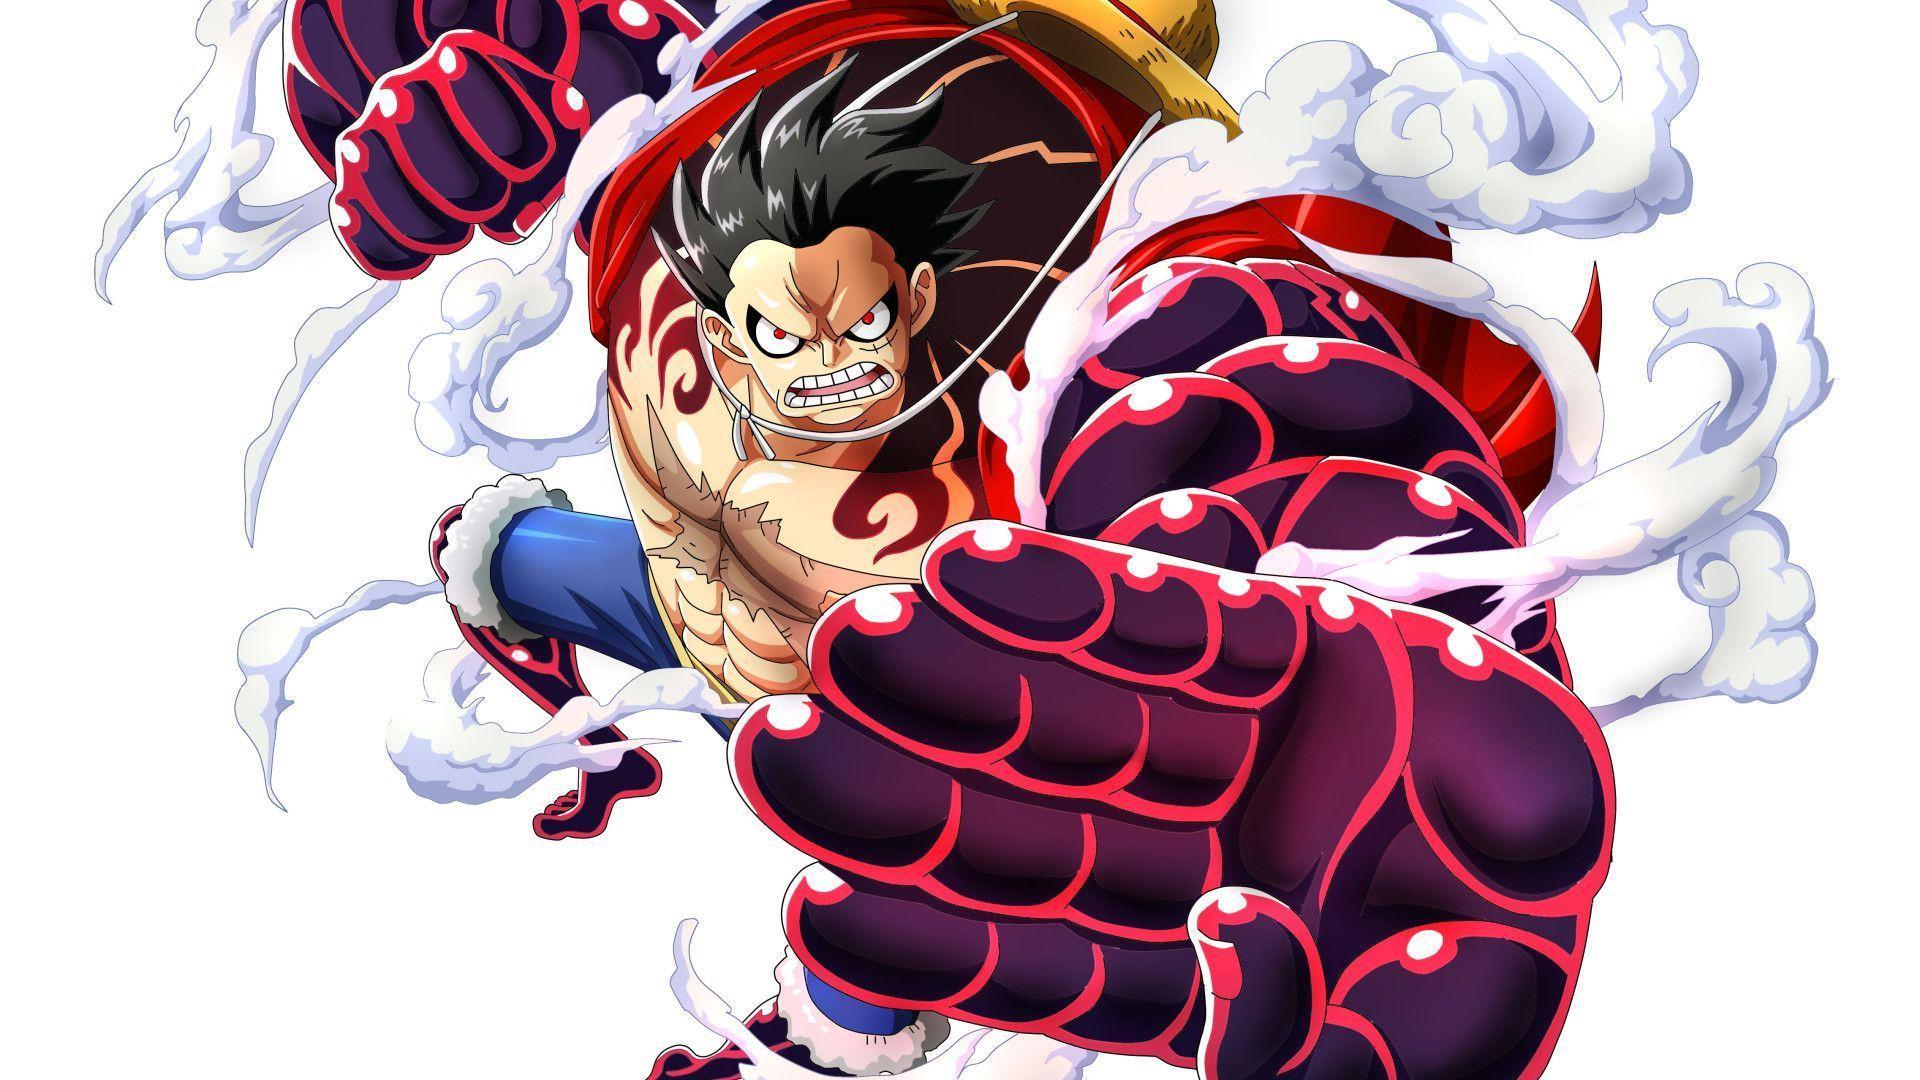 Monkey D Luffy Gear 4 Wallpapers Top Free Monkey D Luffy Gear 4 Backgrounds Wallpaperaccess